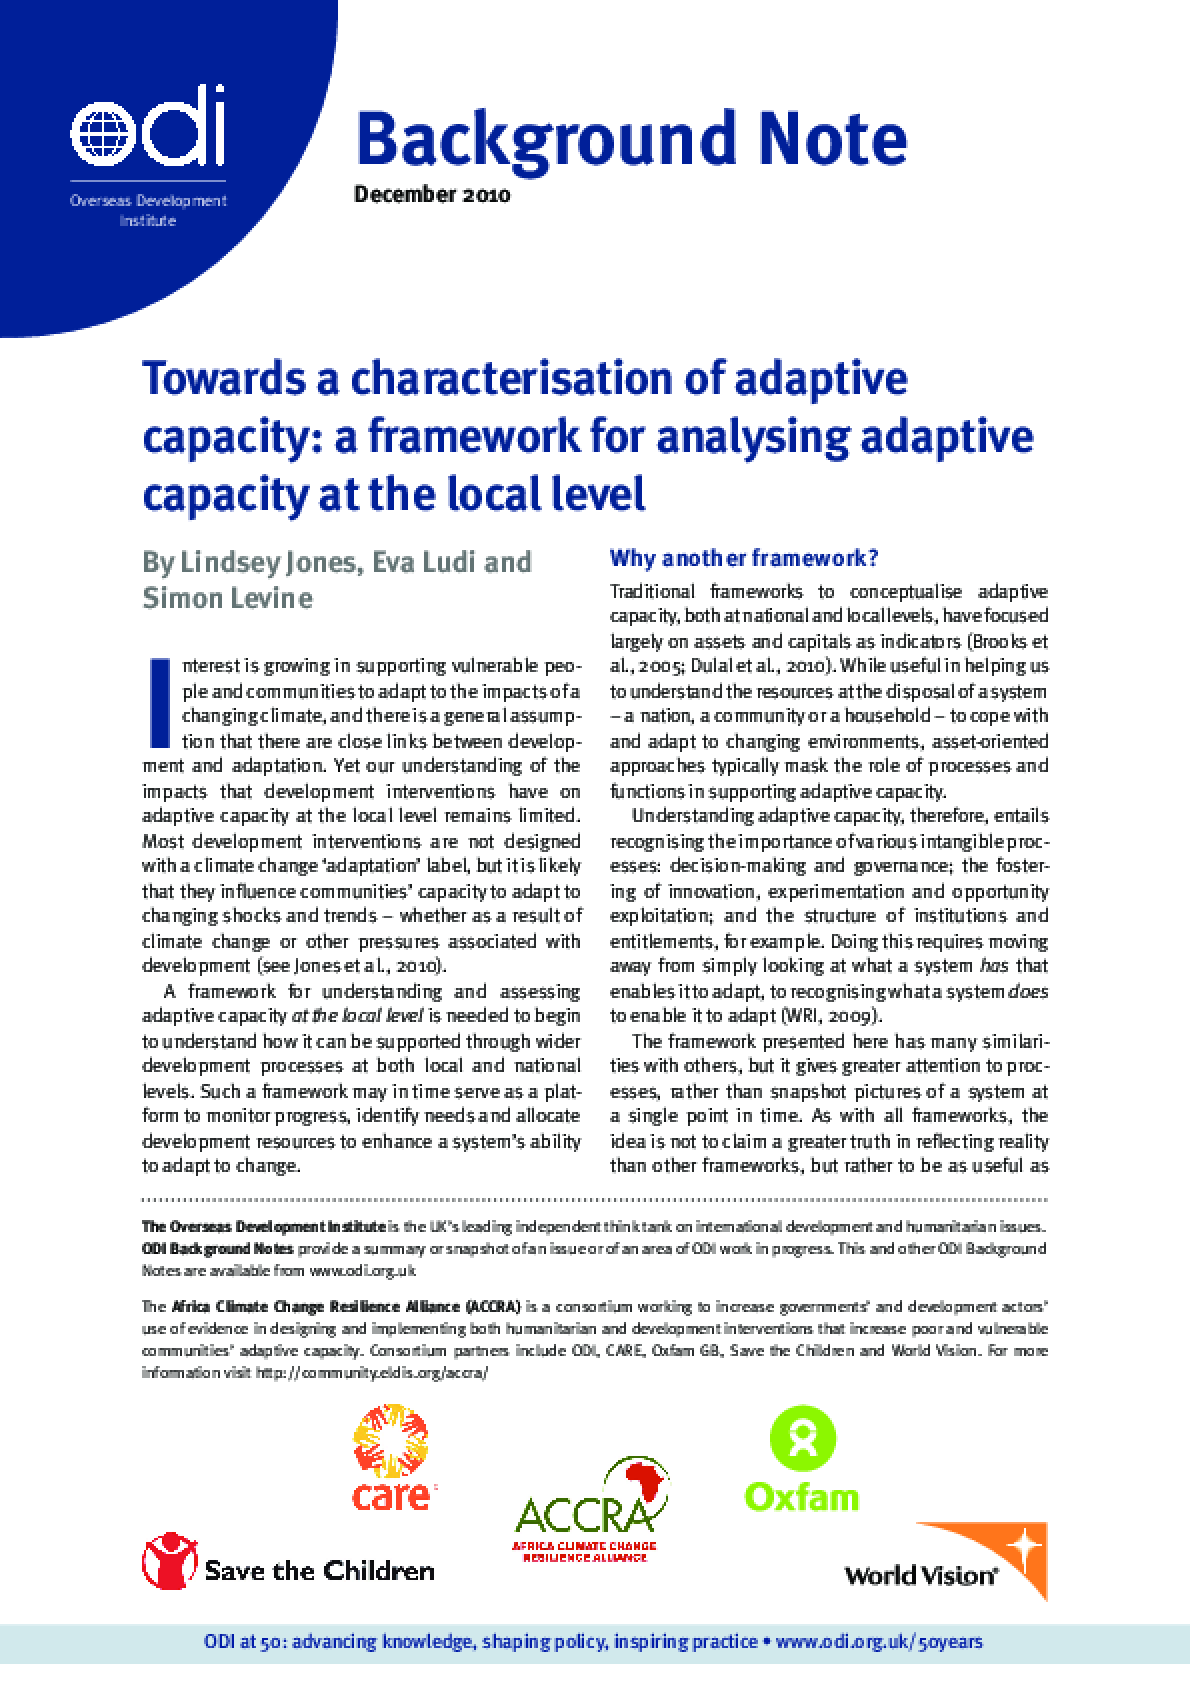 Towards a characterisation of adaptive capacity: A framework for analysing adaptive capacity at the local level